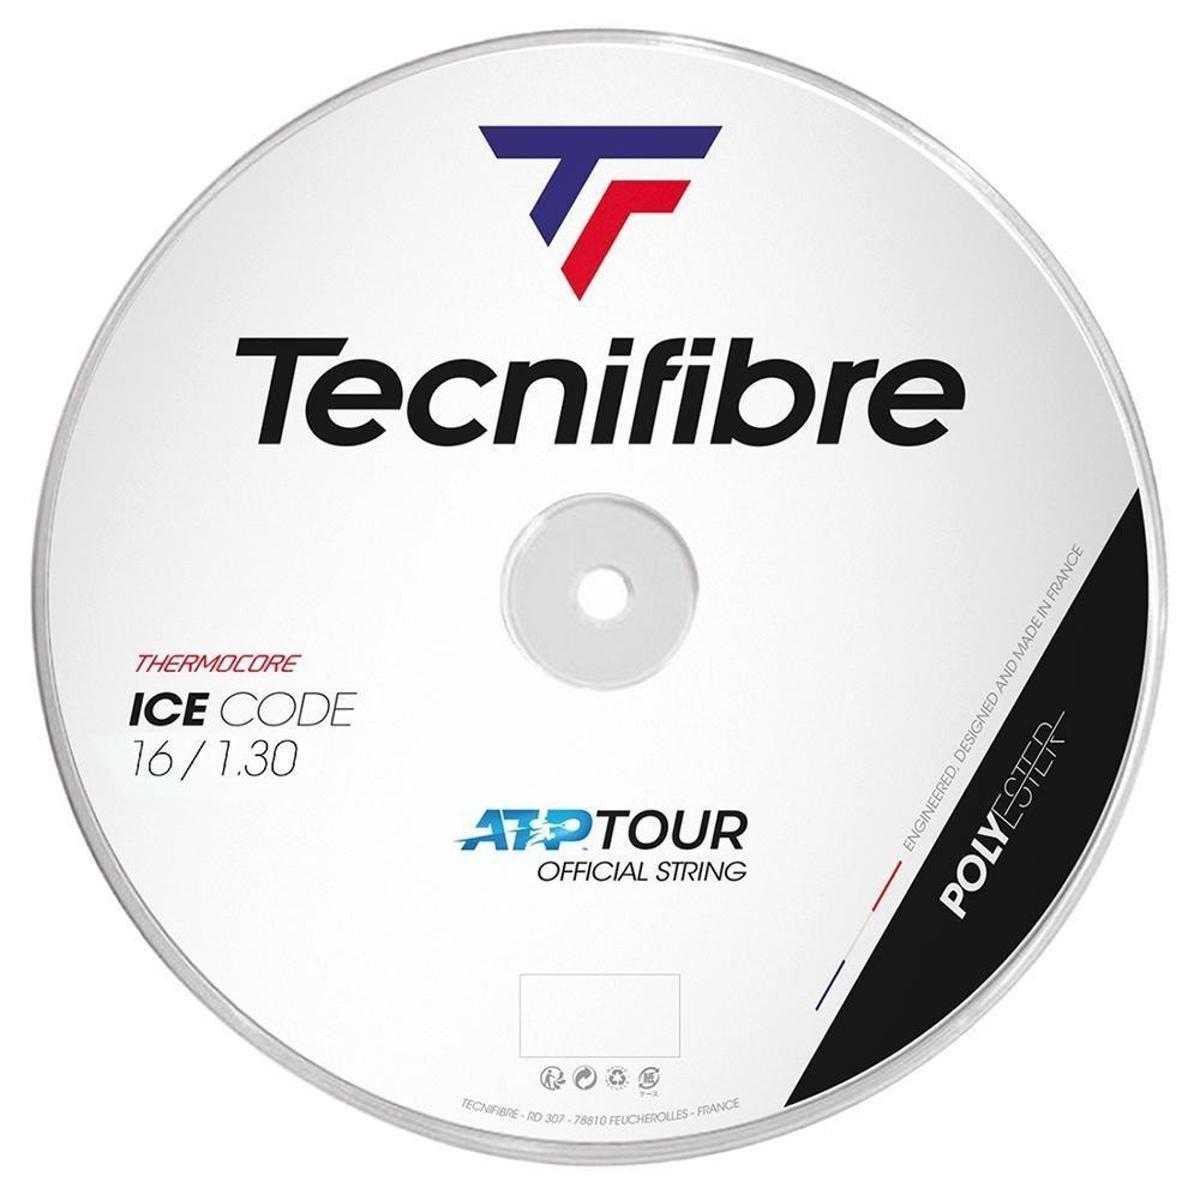 Corda Tecnifibre Ice Code 1,30 - Rolo com 200 Metros